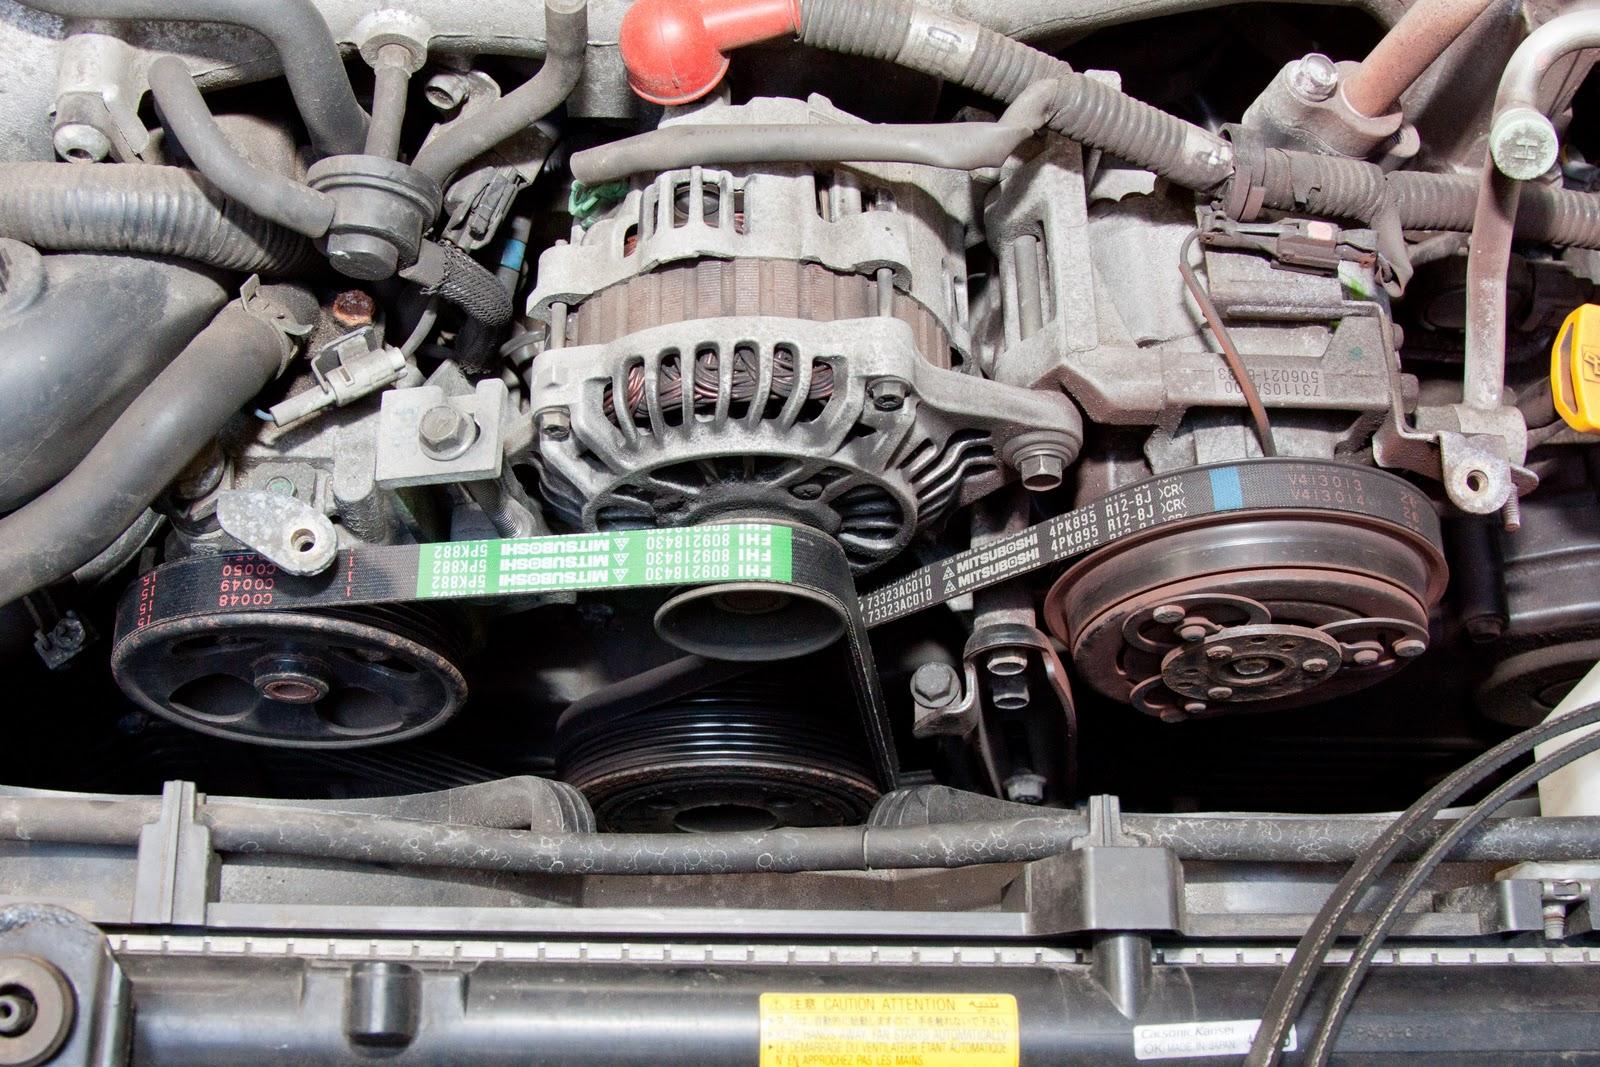 2002 Subaru Forester Engine Diagram Squire Wiring Diagram Bege Wiring Diagram